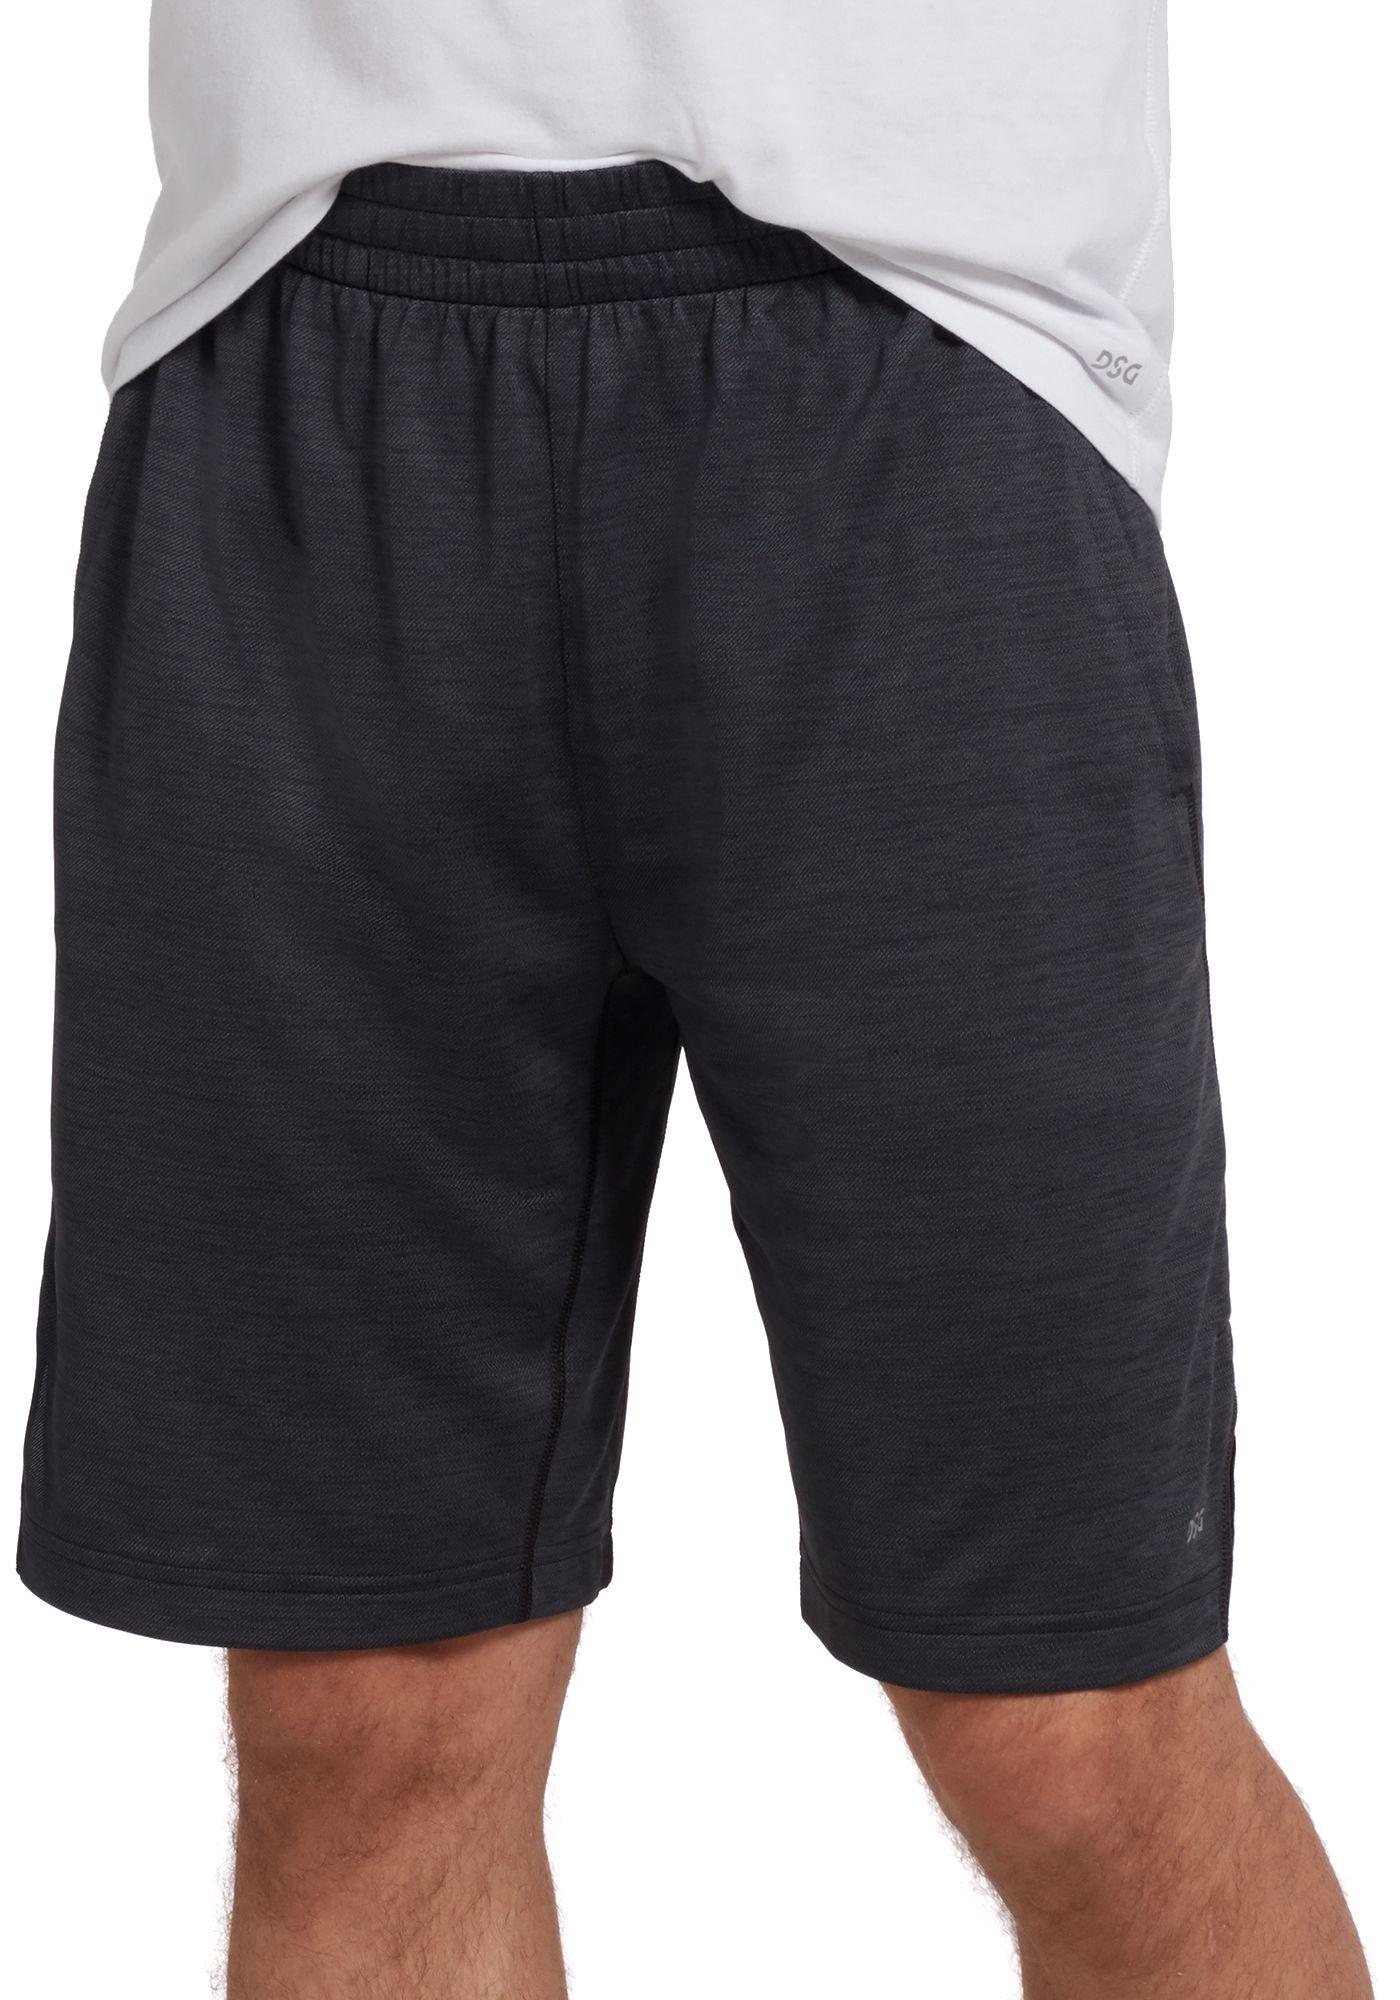 DSG Men's Jacquard Training Shorts